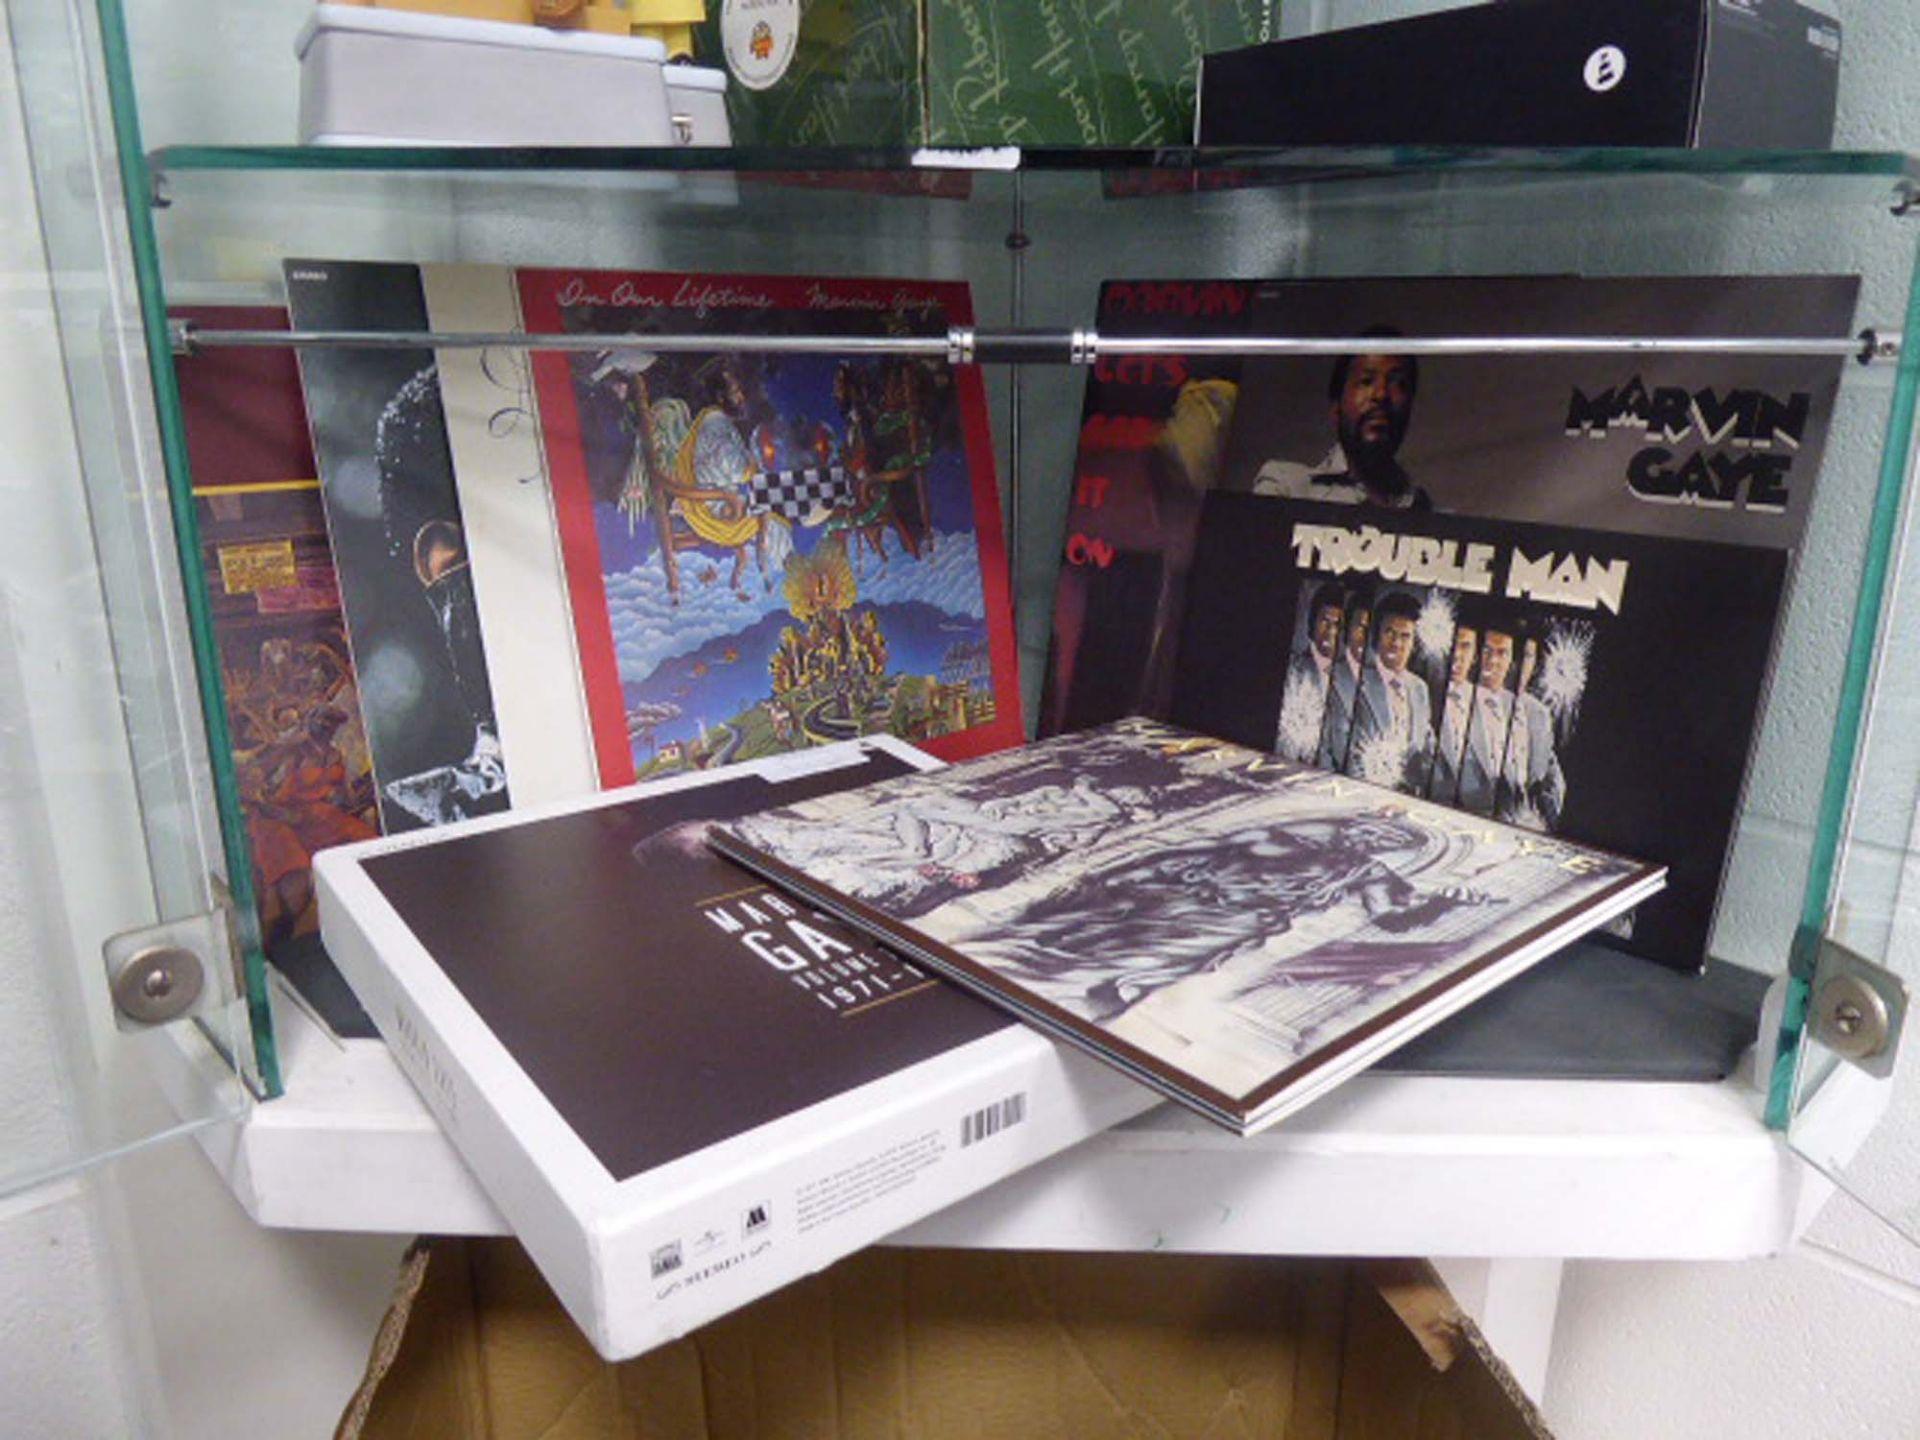 Marvin Gaye volume 3 1971-1981 record set